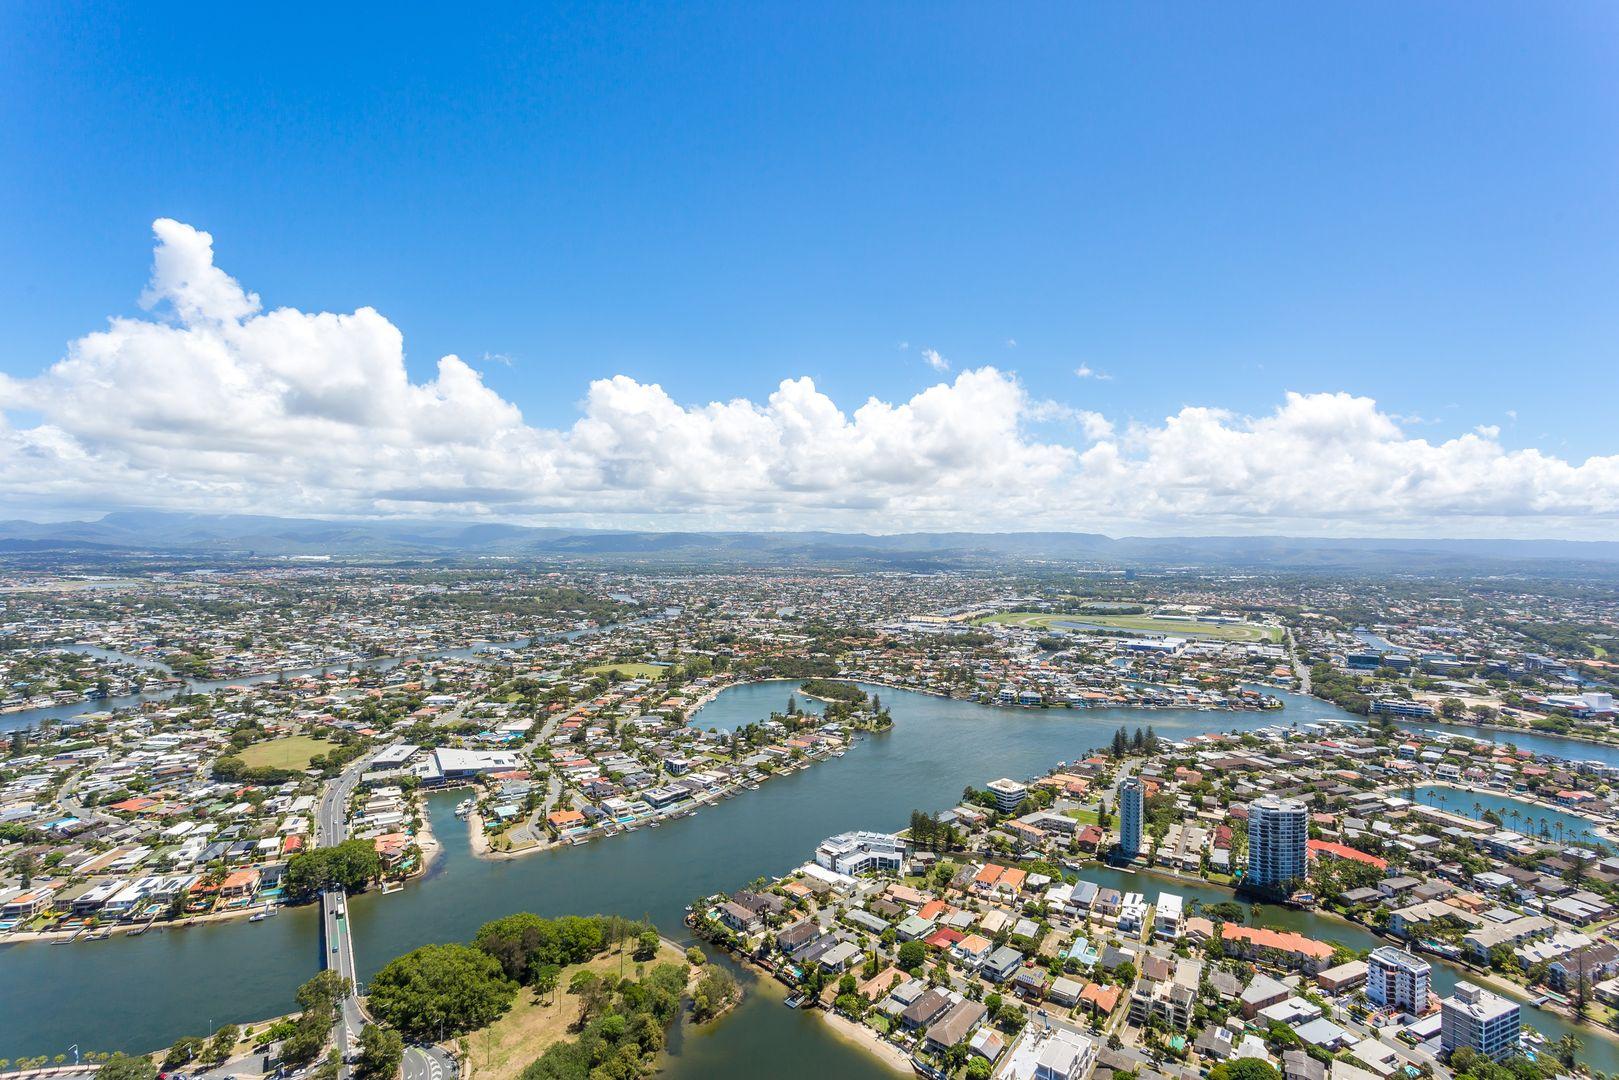 Level 67, 6704/9 'Q1' Hamilton Avenue, Surfers Paradise QLD 4217, Image 1